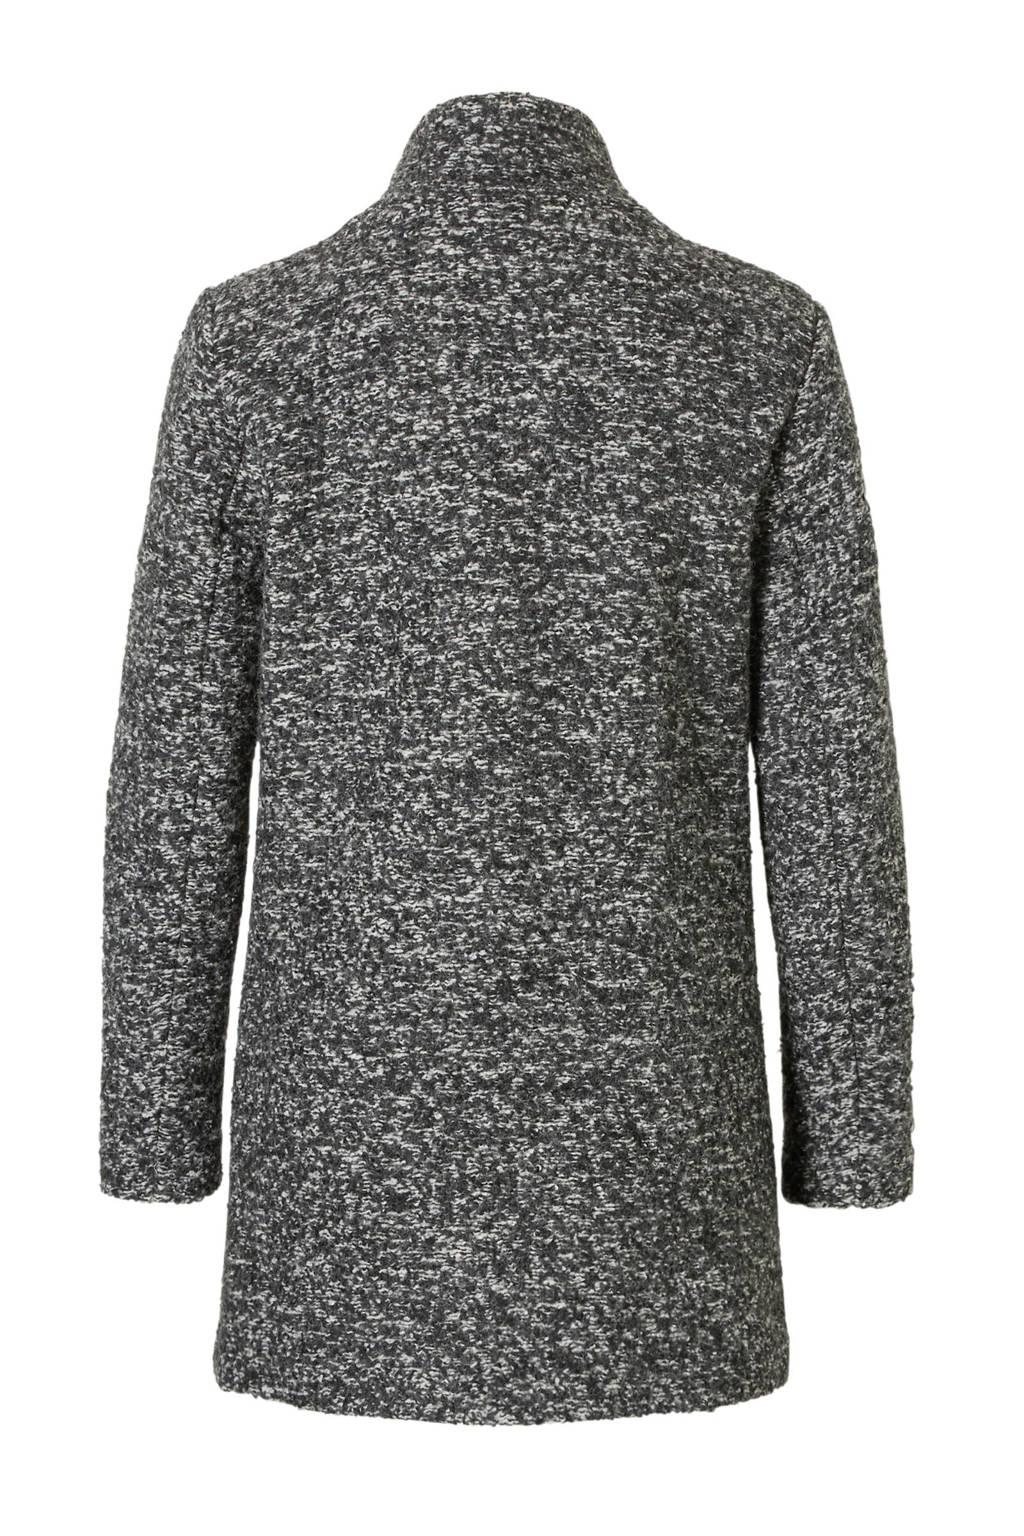 ONLY coat, Grijs/wit